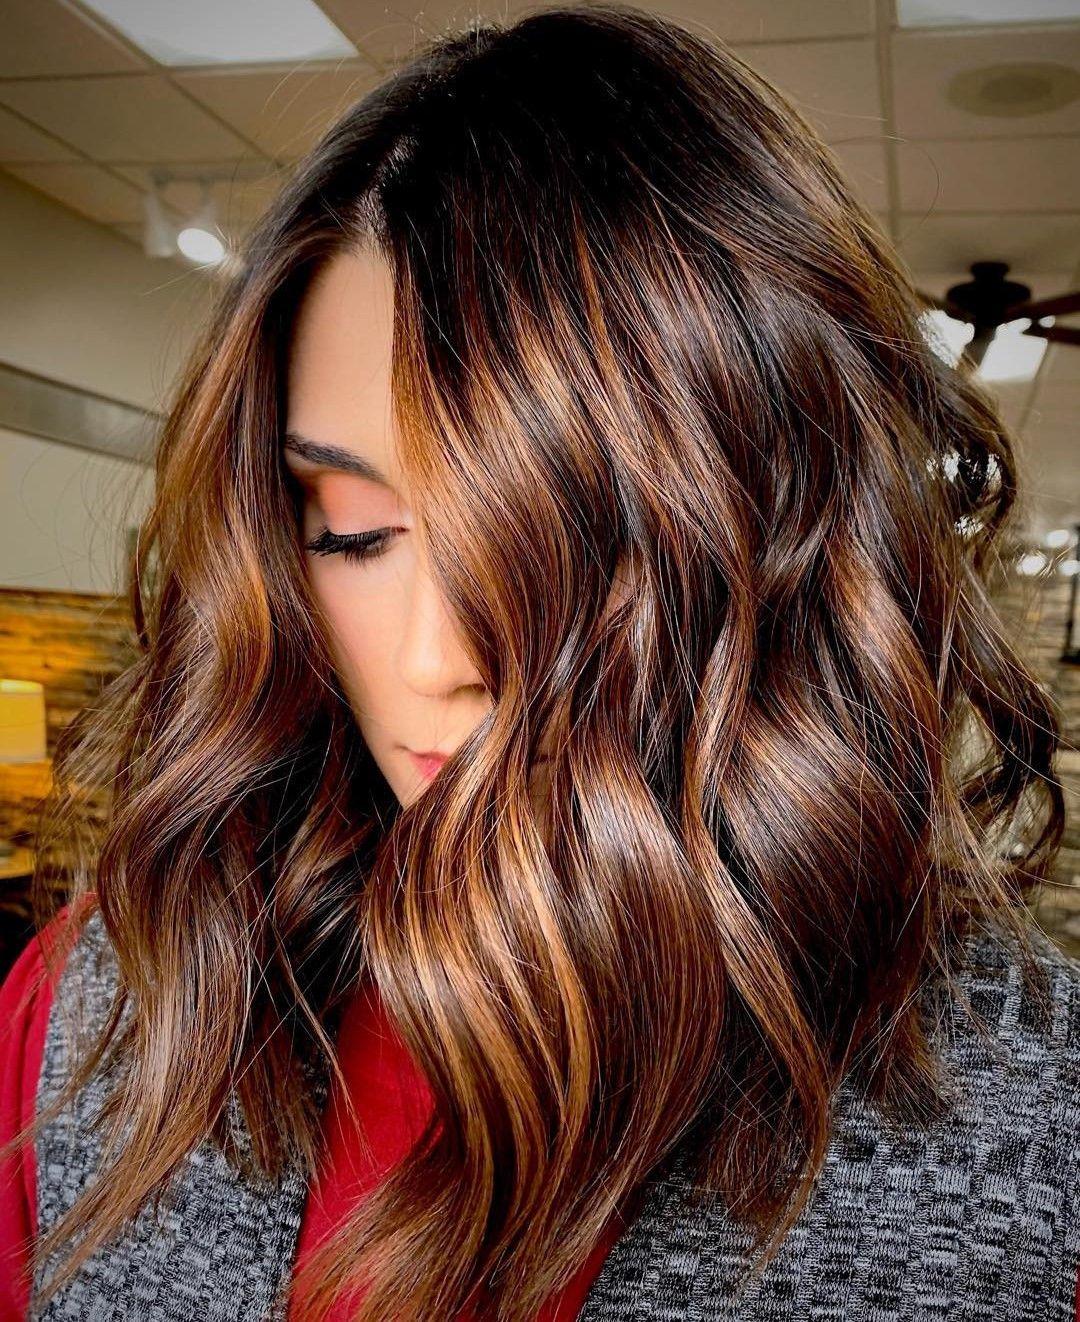 50 Dainty Auburn Hair Ideas to Inspire Your Next Color Appointment – Hair Adviser